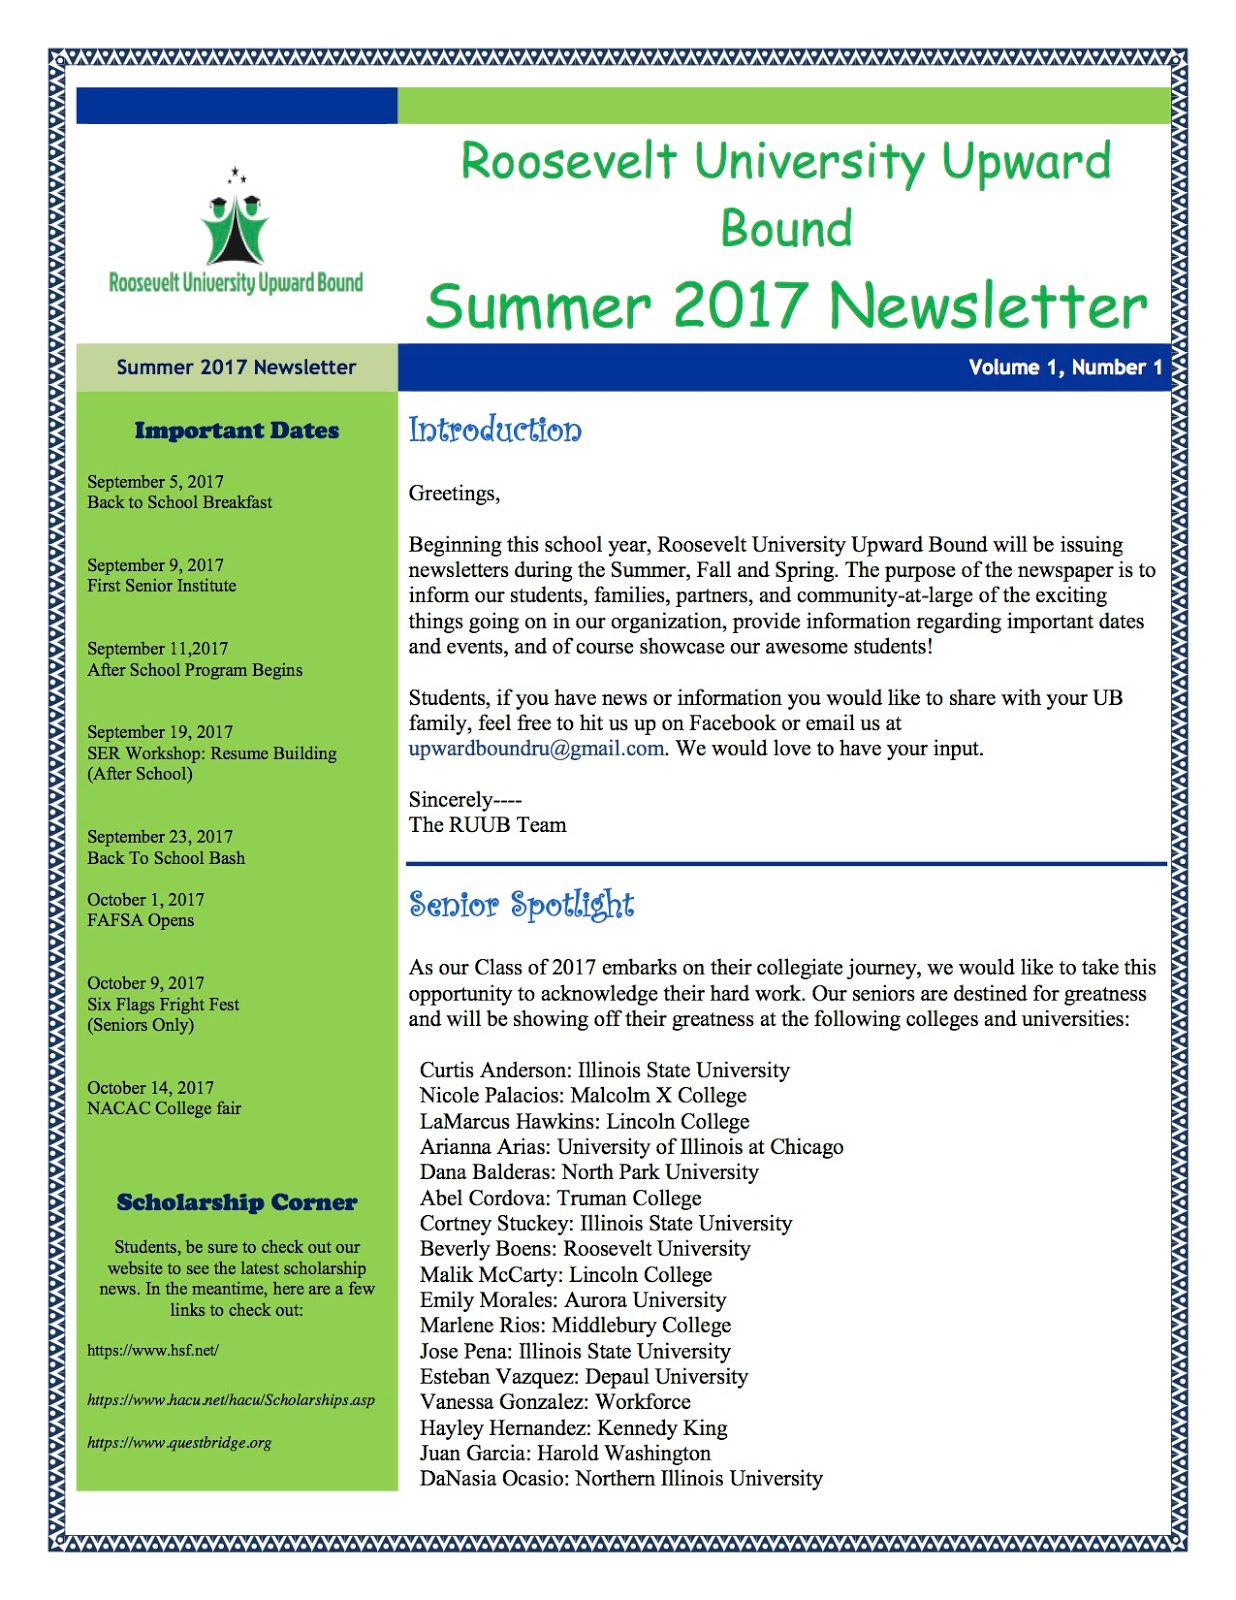 Roosevelt University Email >> Everything Coe Ru Upward Bound Launches Newsletter